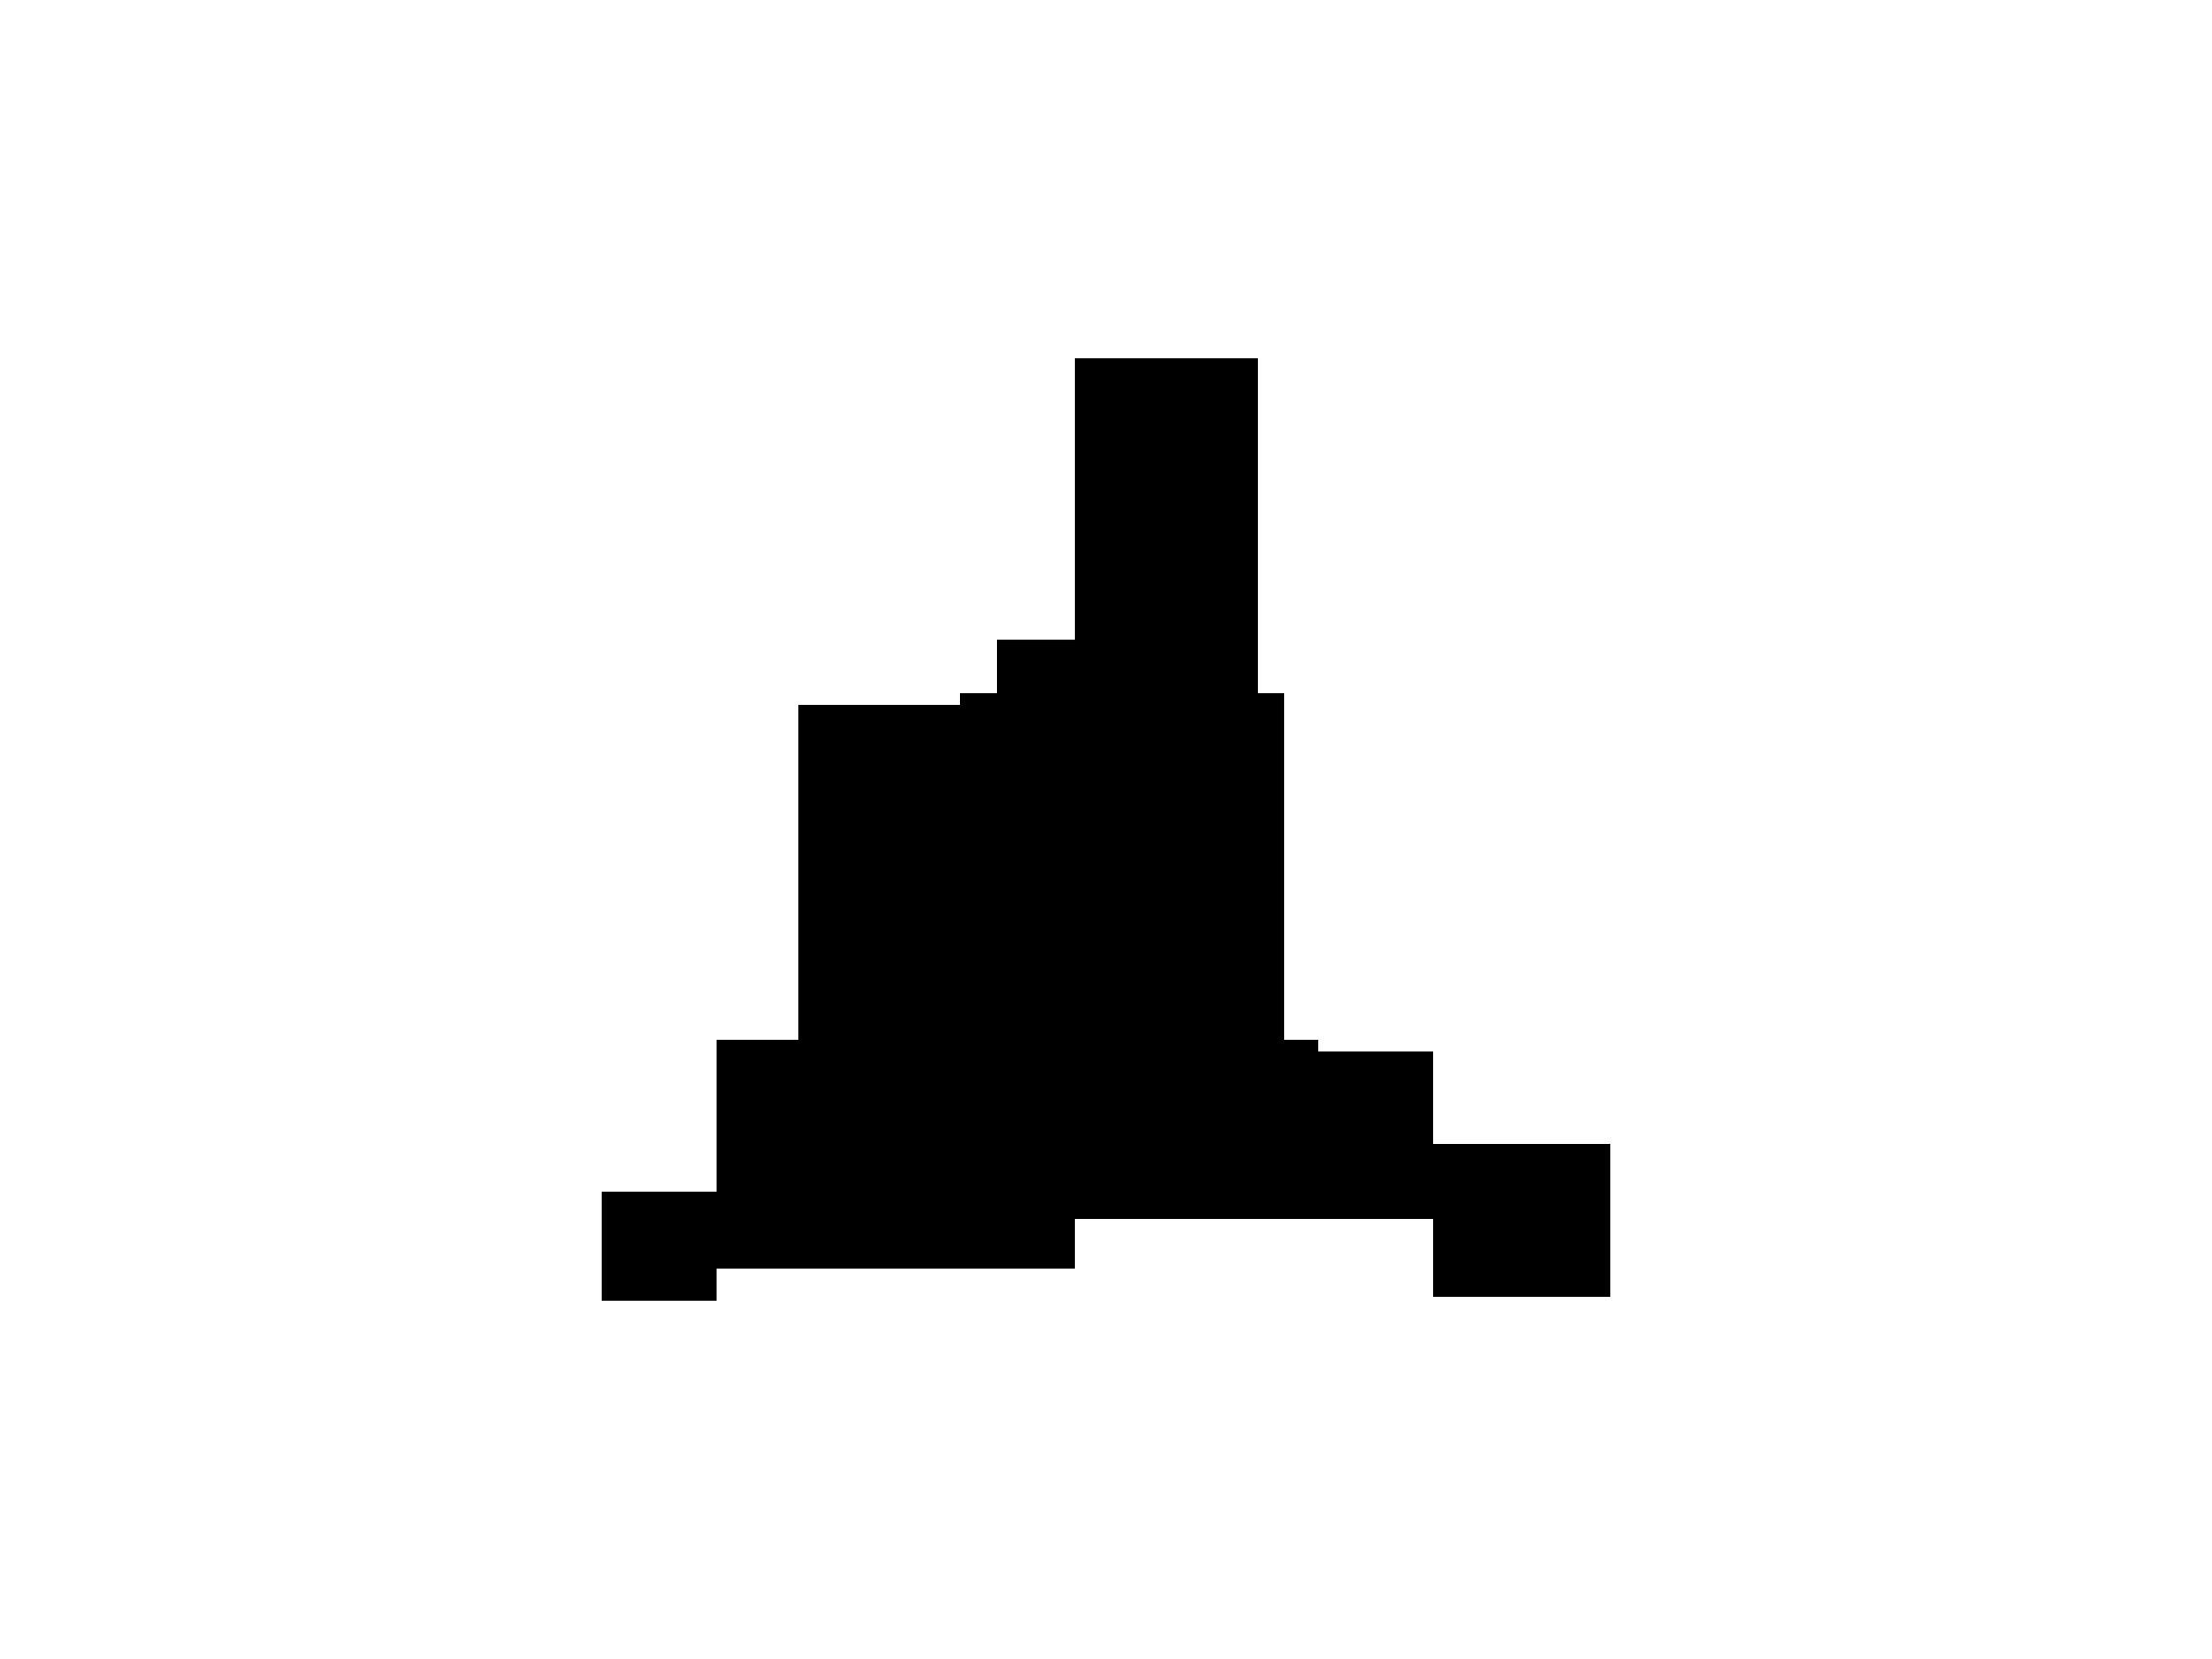 nike logo - Google Search | logos | Pinterest | Jordans, Nike logo ...